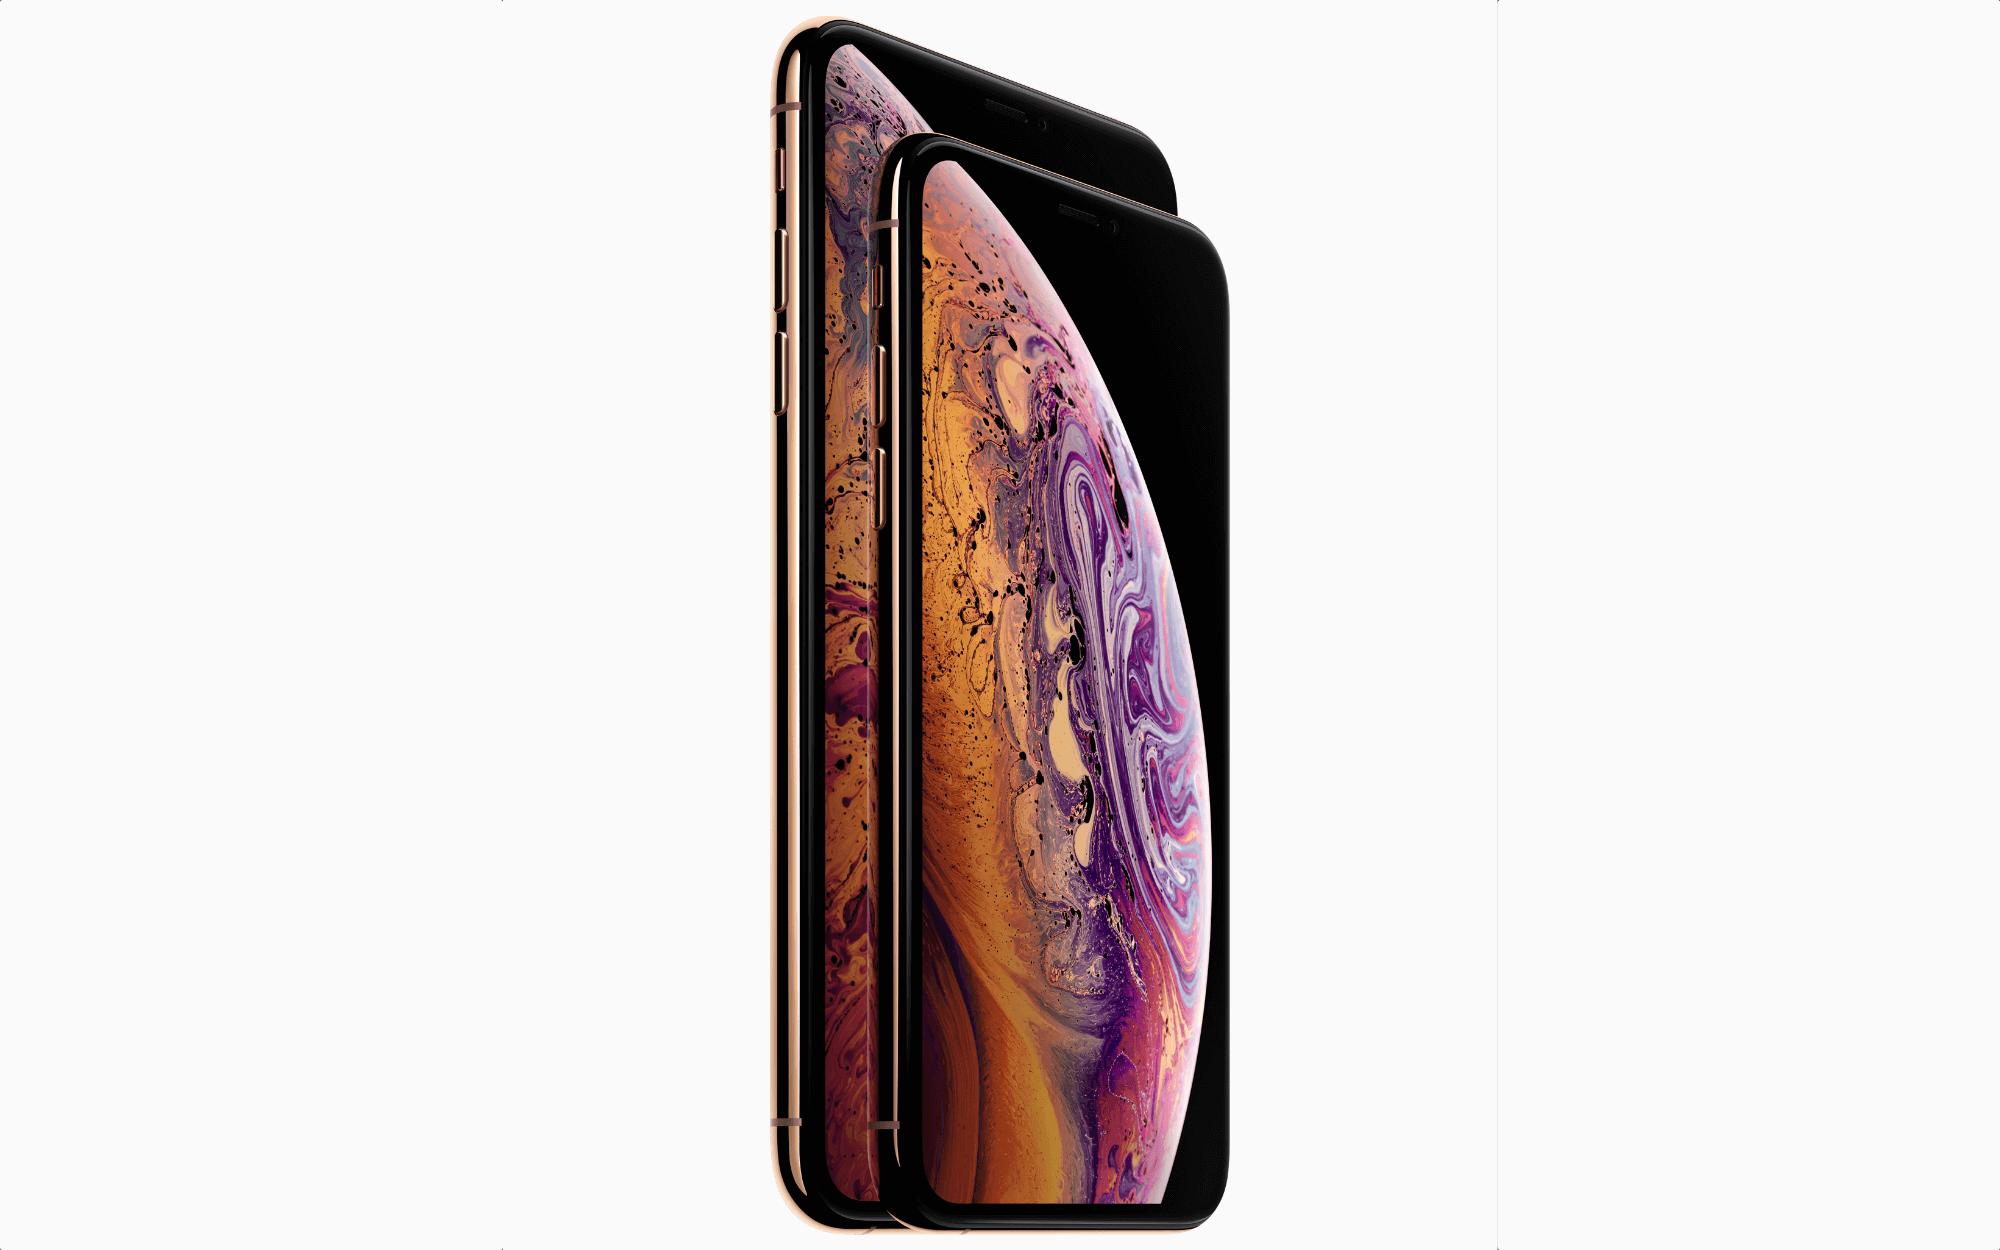 iPhone XS Max Jailbreake iOS 12